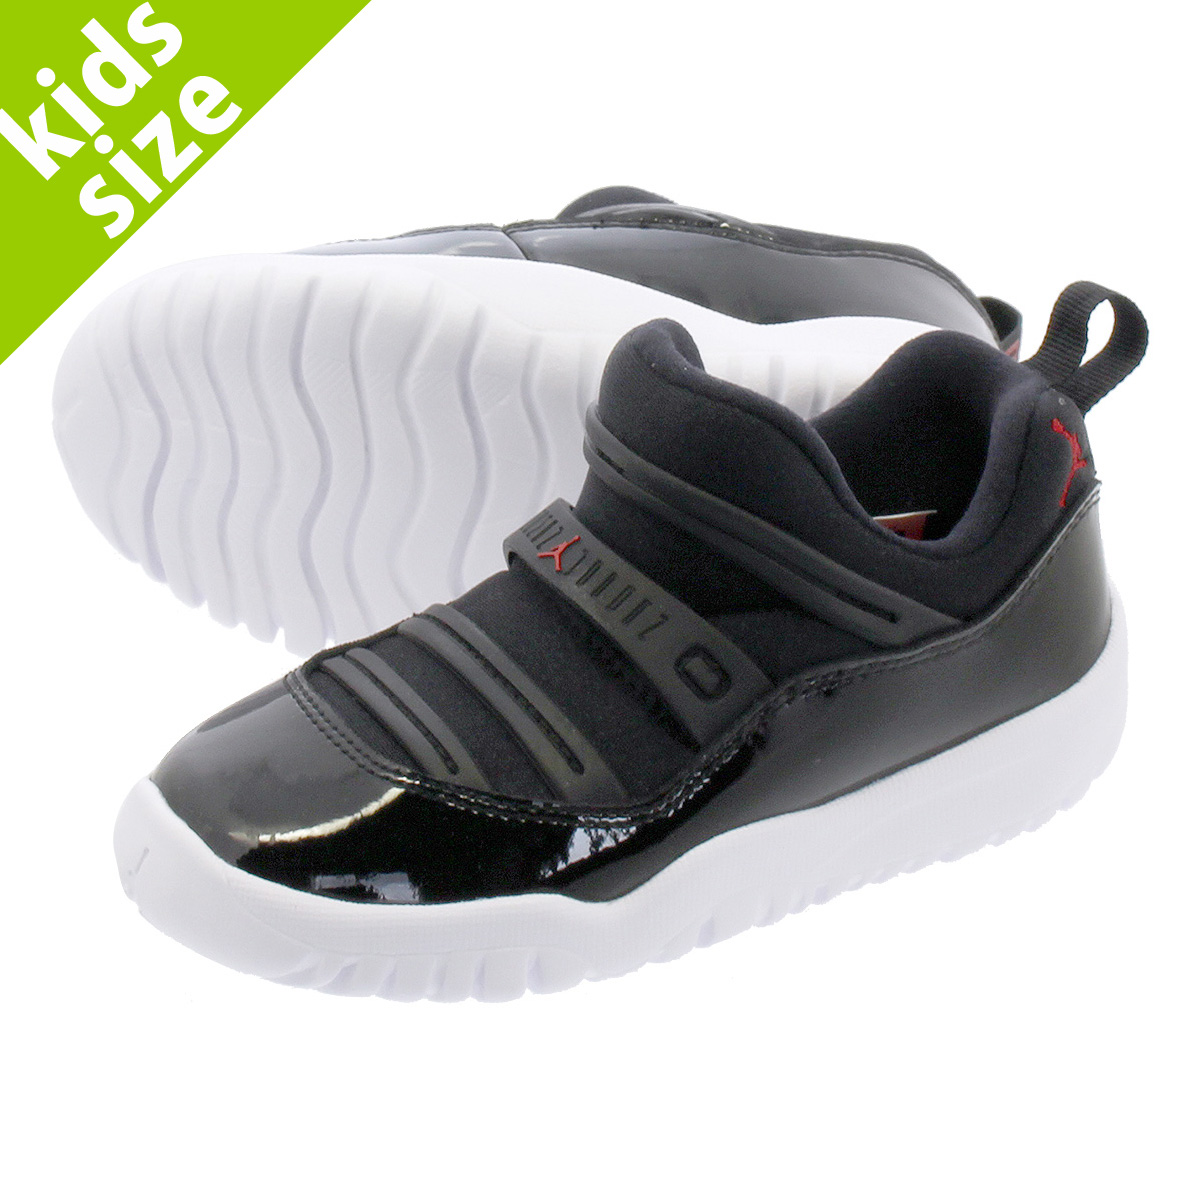 brand new 8f618 64a83 NIKE AIR JORDAN 11 RETRO LITTLE FLEX TD Nike Air Jordan 11 nostalgic little  flextime TD BLACK/GYM RED/WHITE bq7102-002